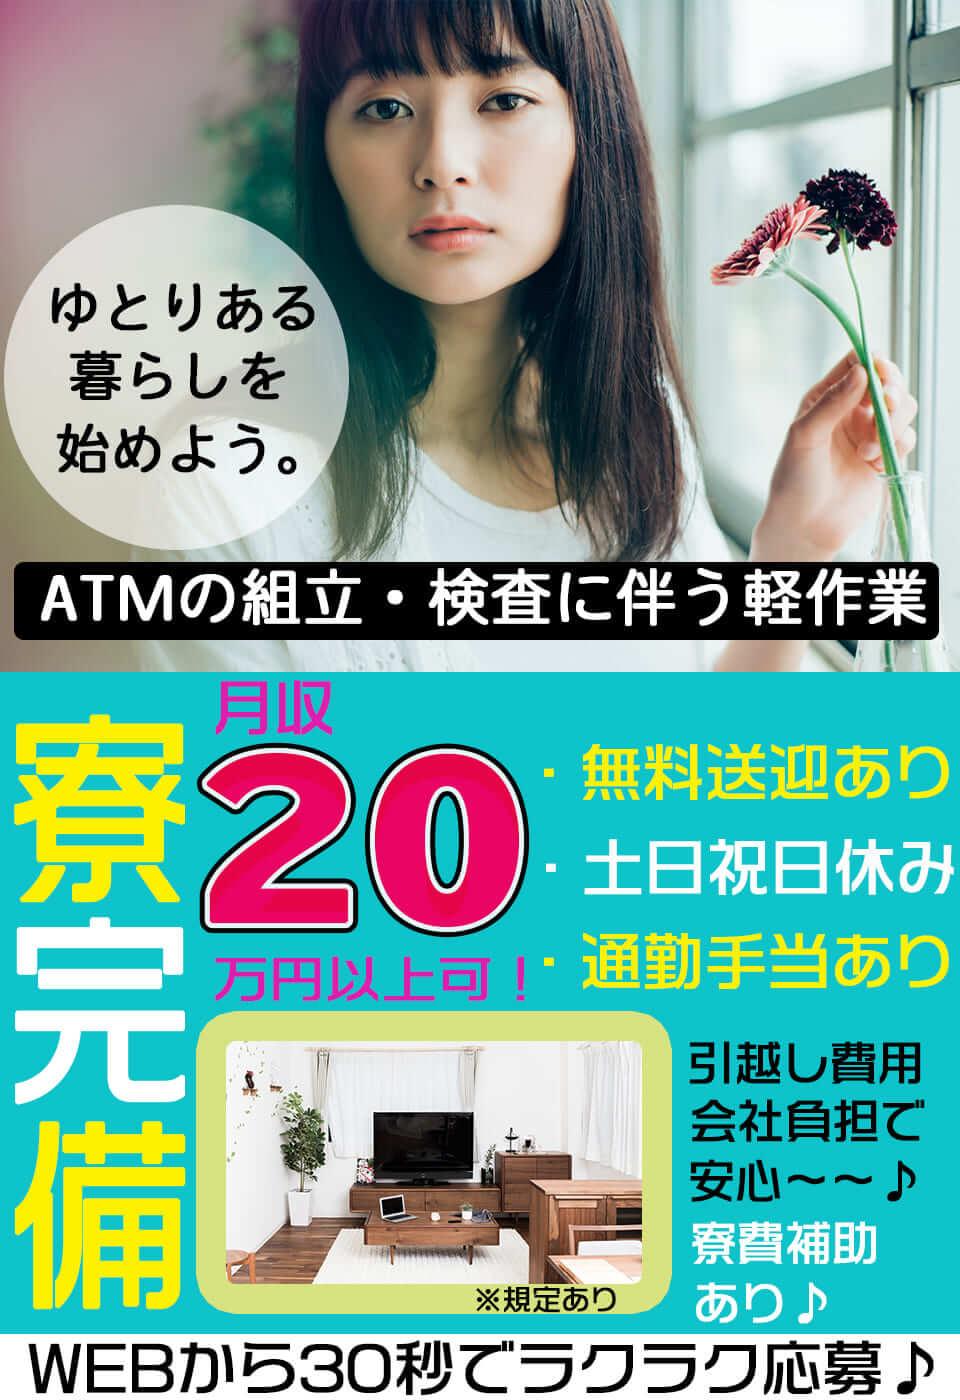 Tomiokashimain2 5